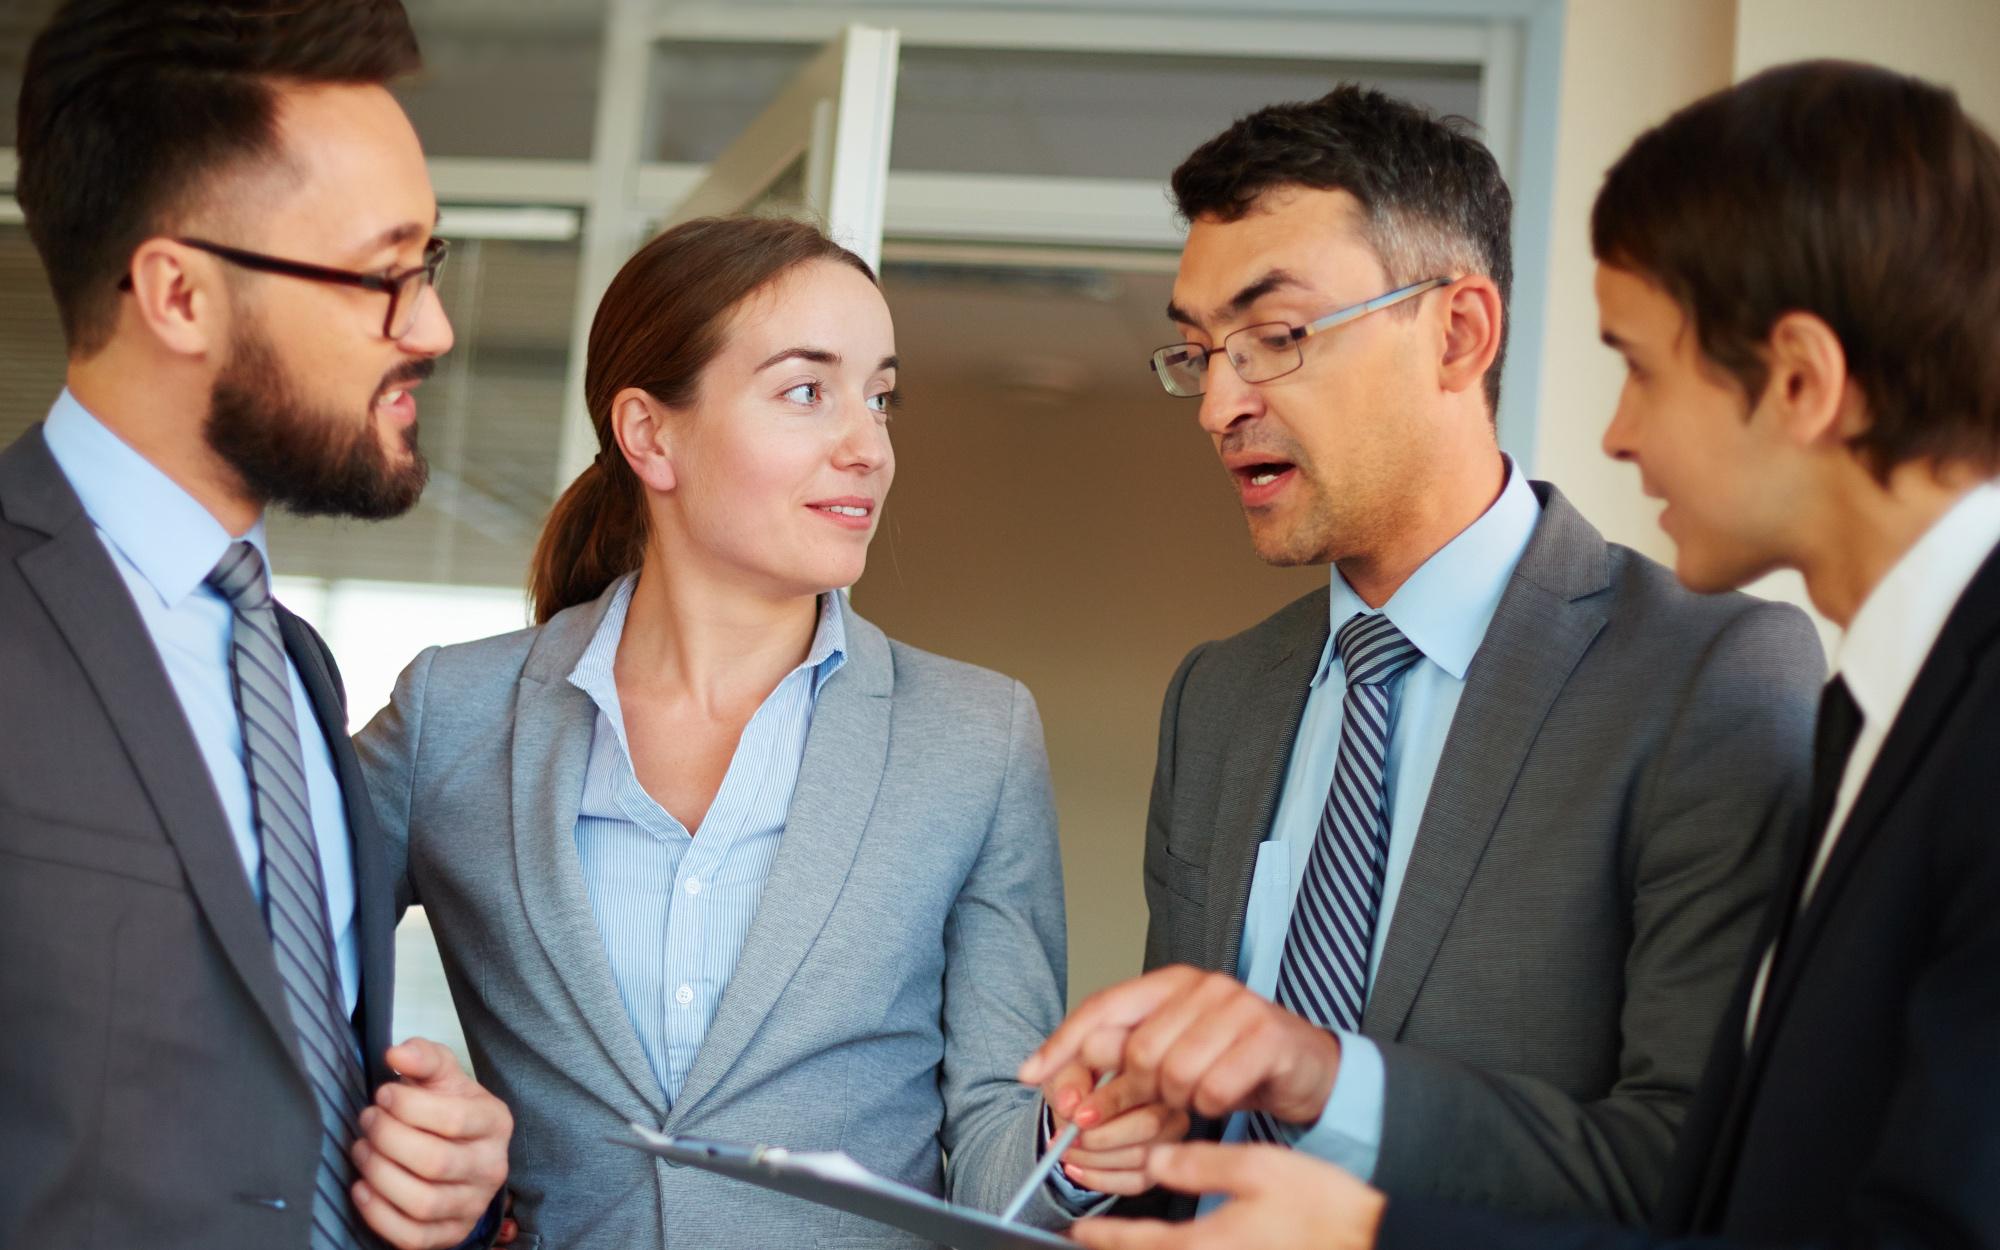 Leadership & Communication Skills - For Leaders & Executives